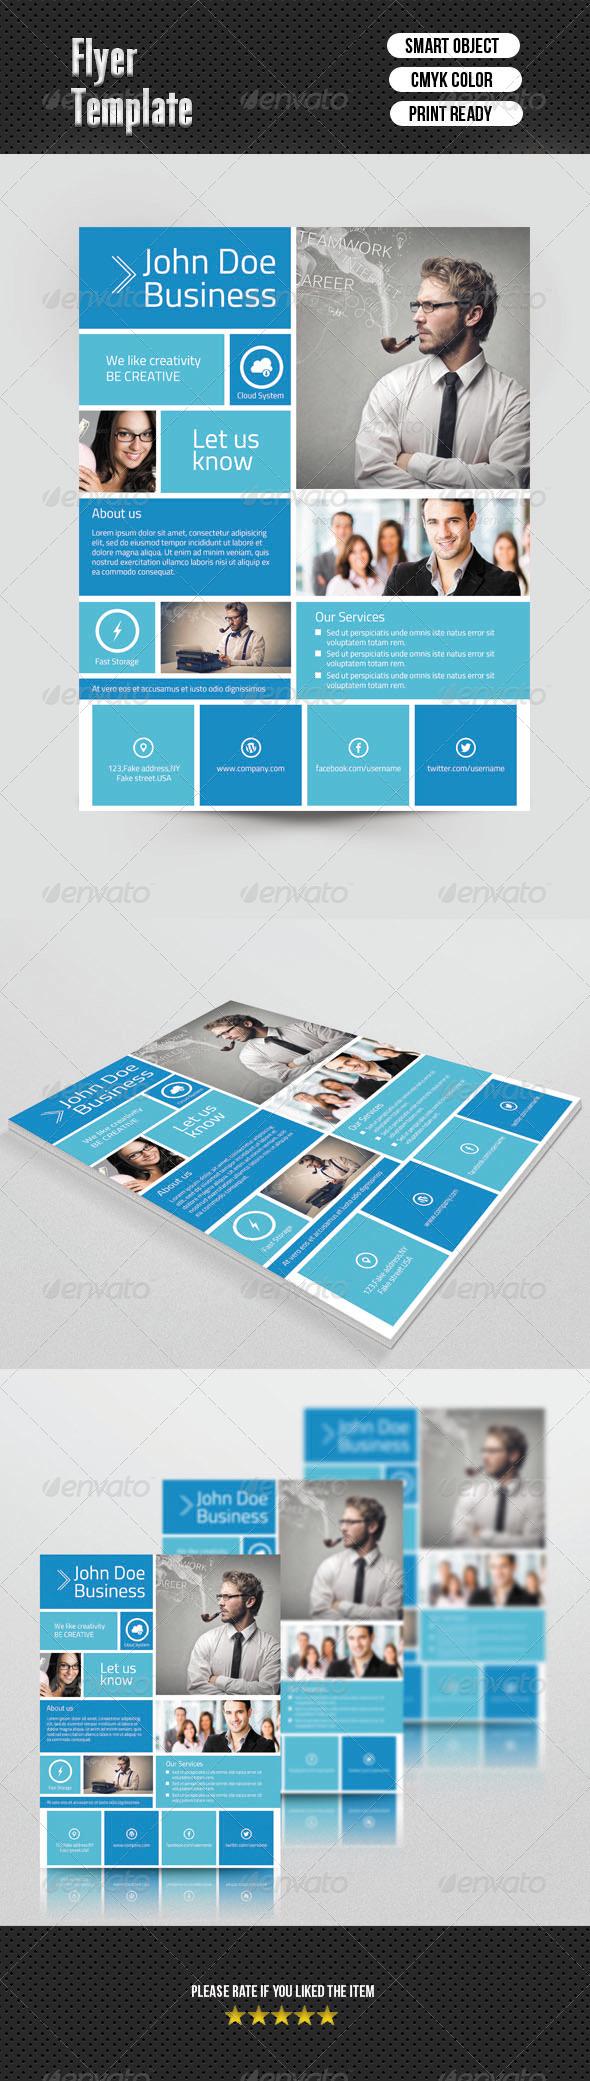 GraphicRiver Metro Style Flyer 6826335